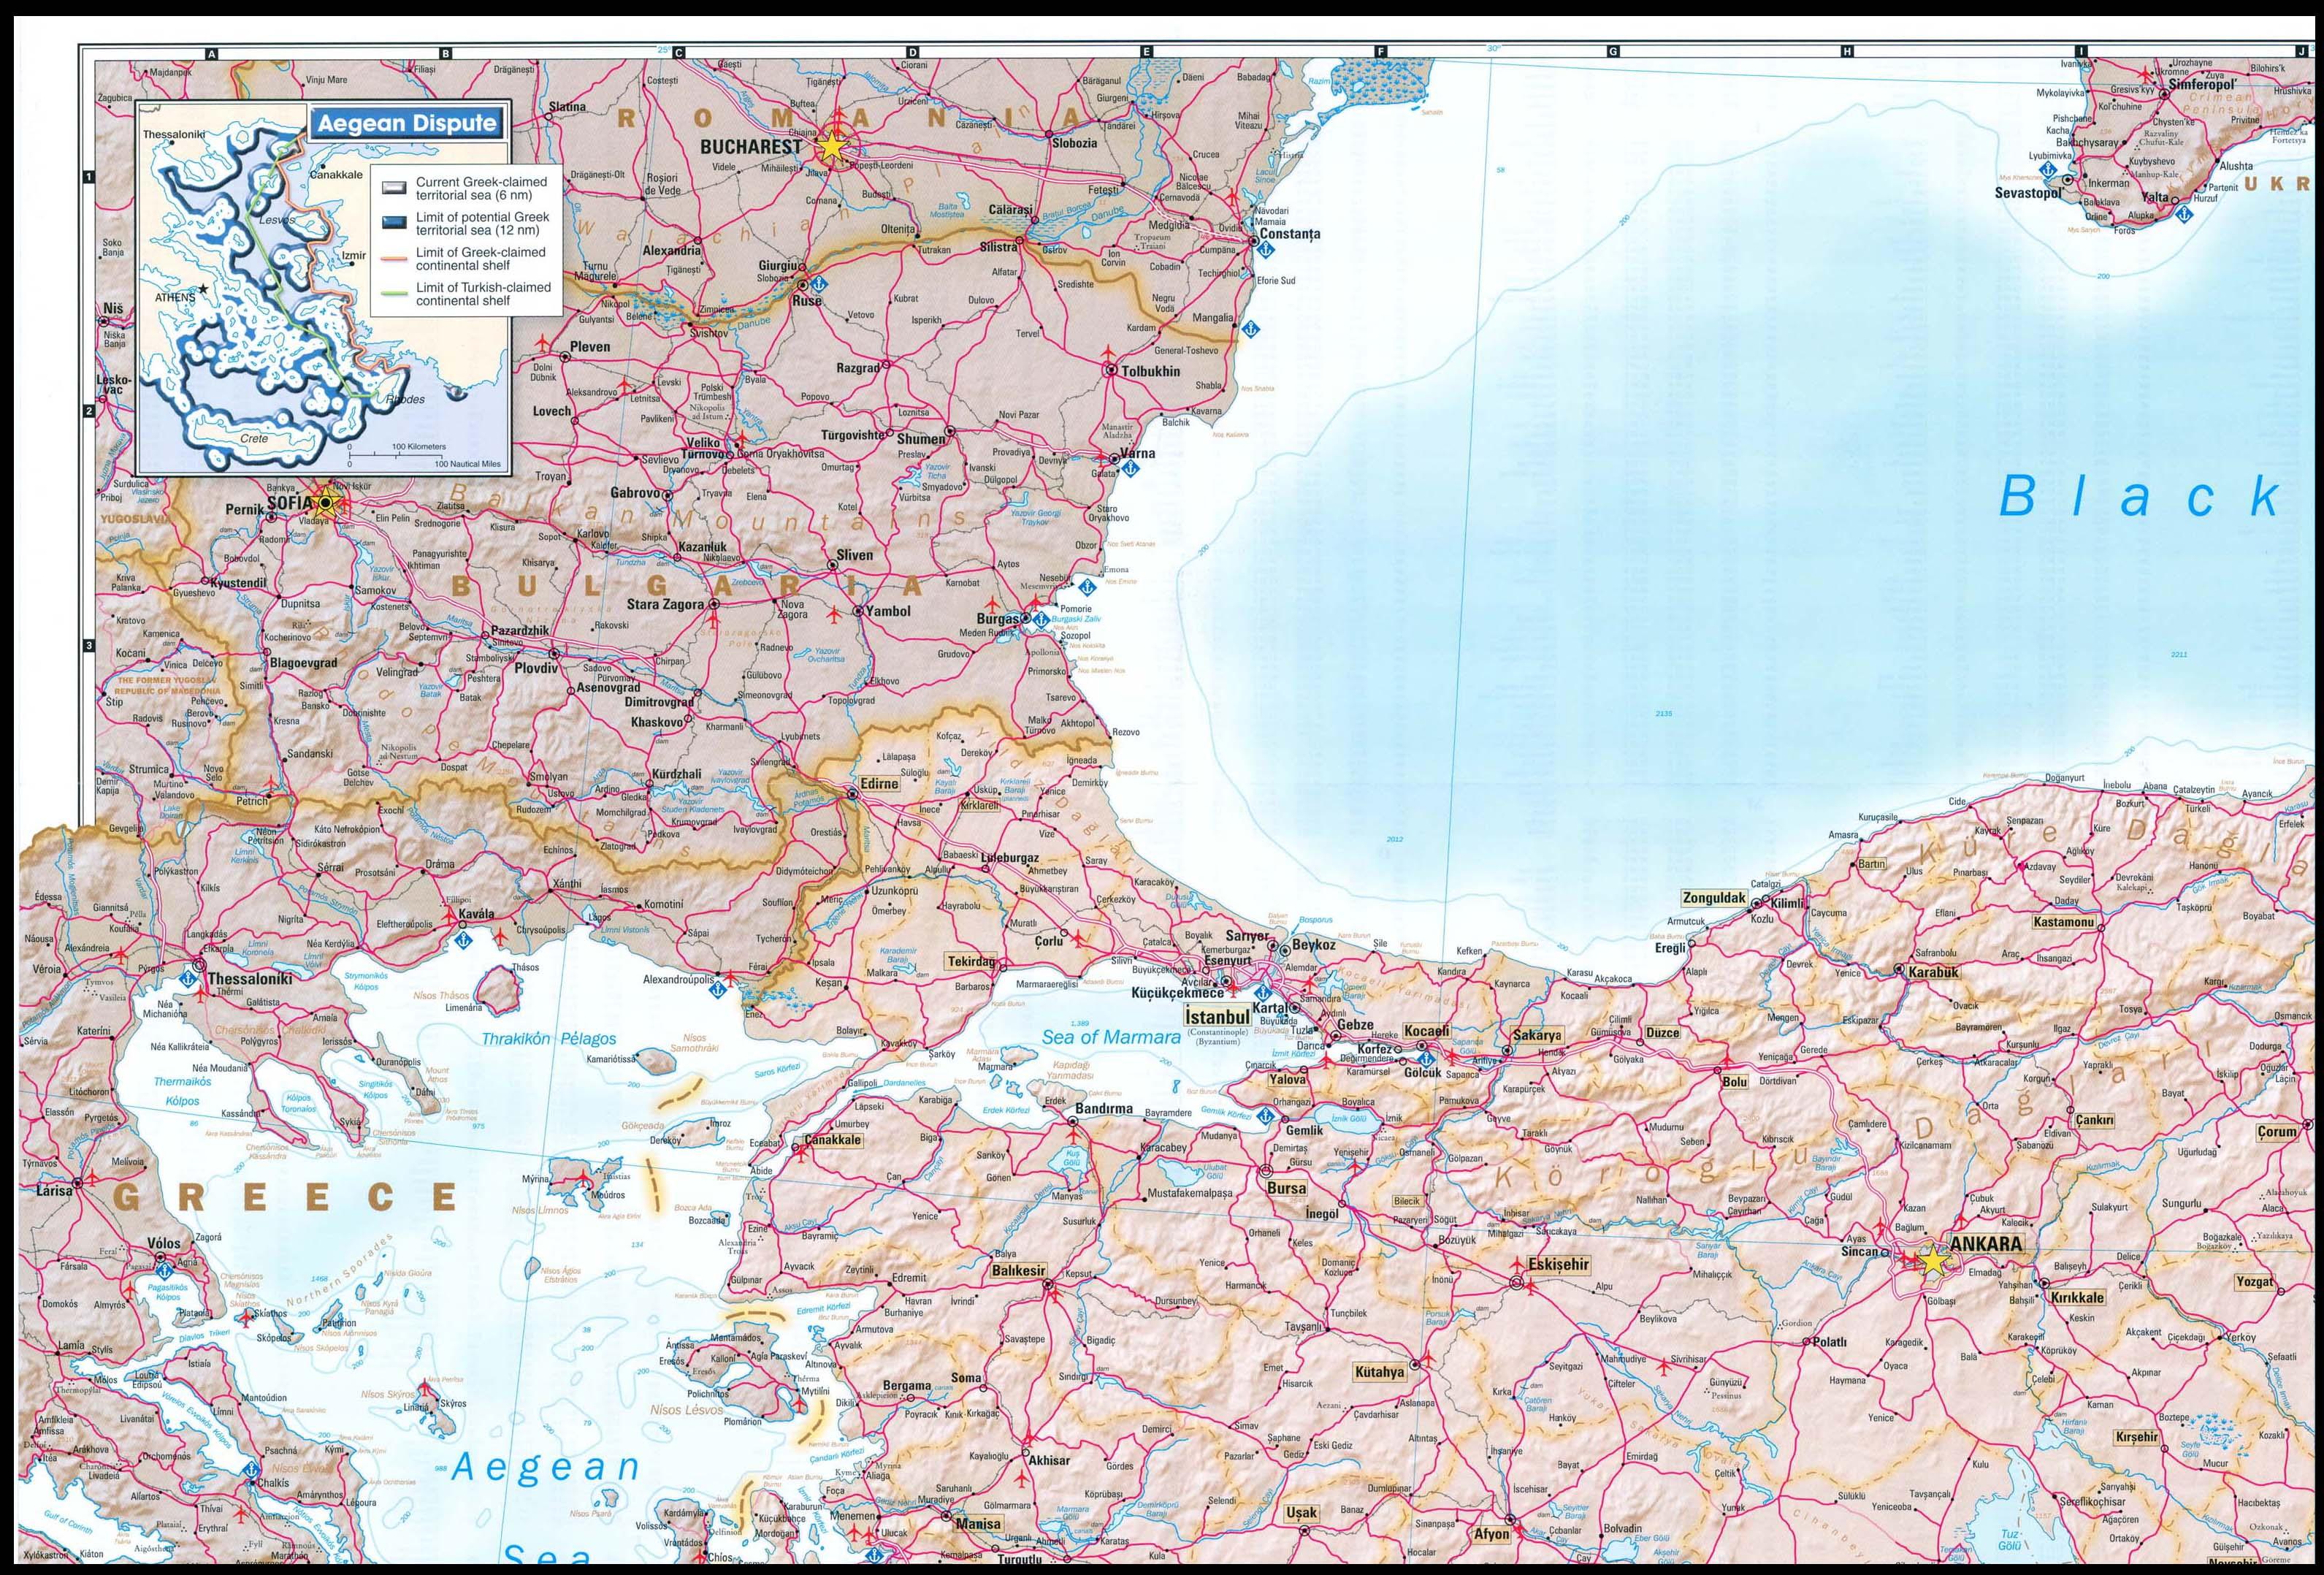 Republic of Turkey 2002 - Perry-Castañeda Map Collection - UT ...